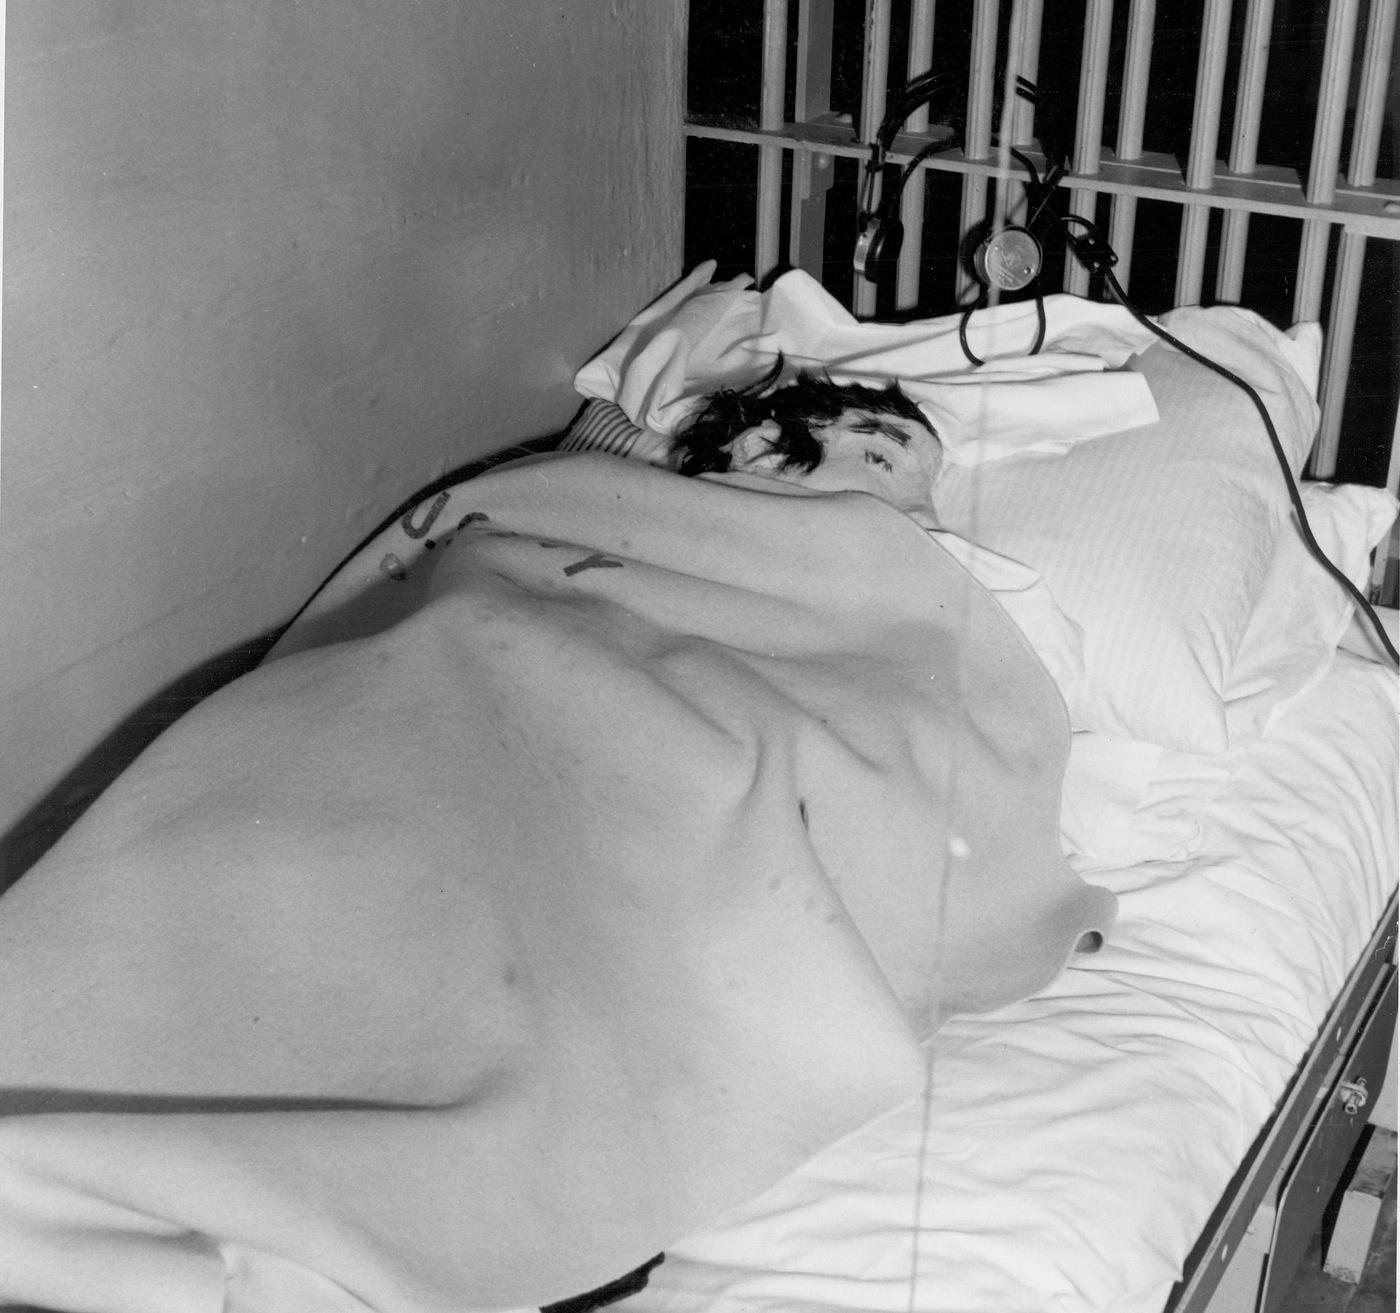 Alcatraz Dummy Head in Bed